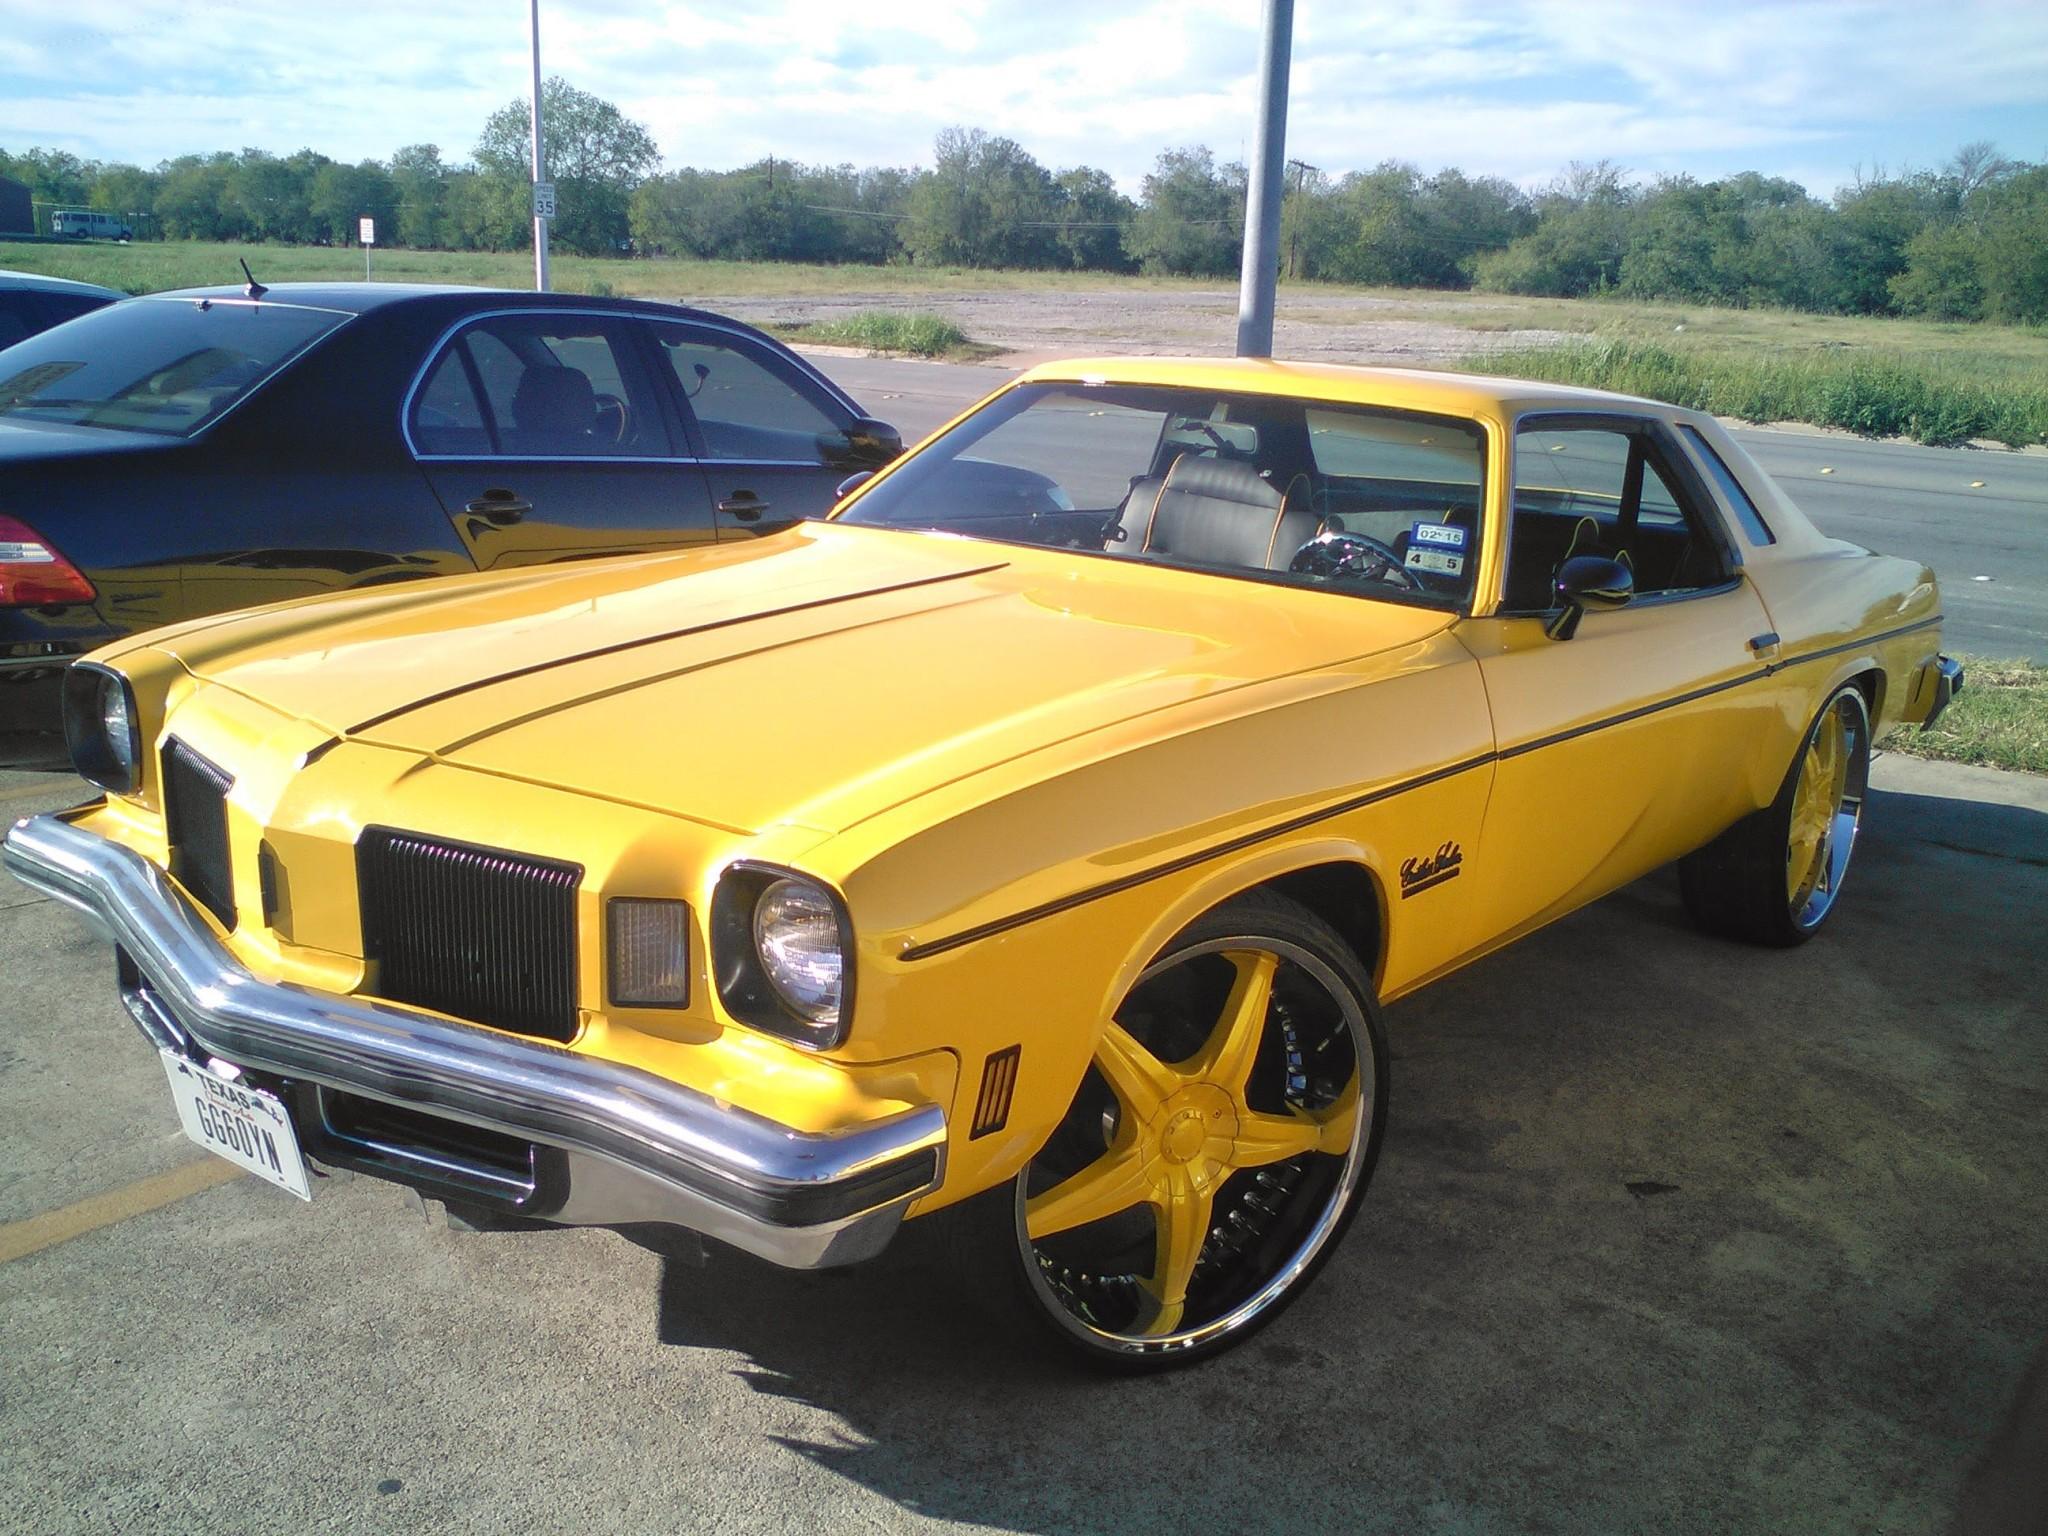 Cutlass On 30 Inch Rims : Box chevy on inch ballers wheels big rims custom